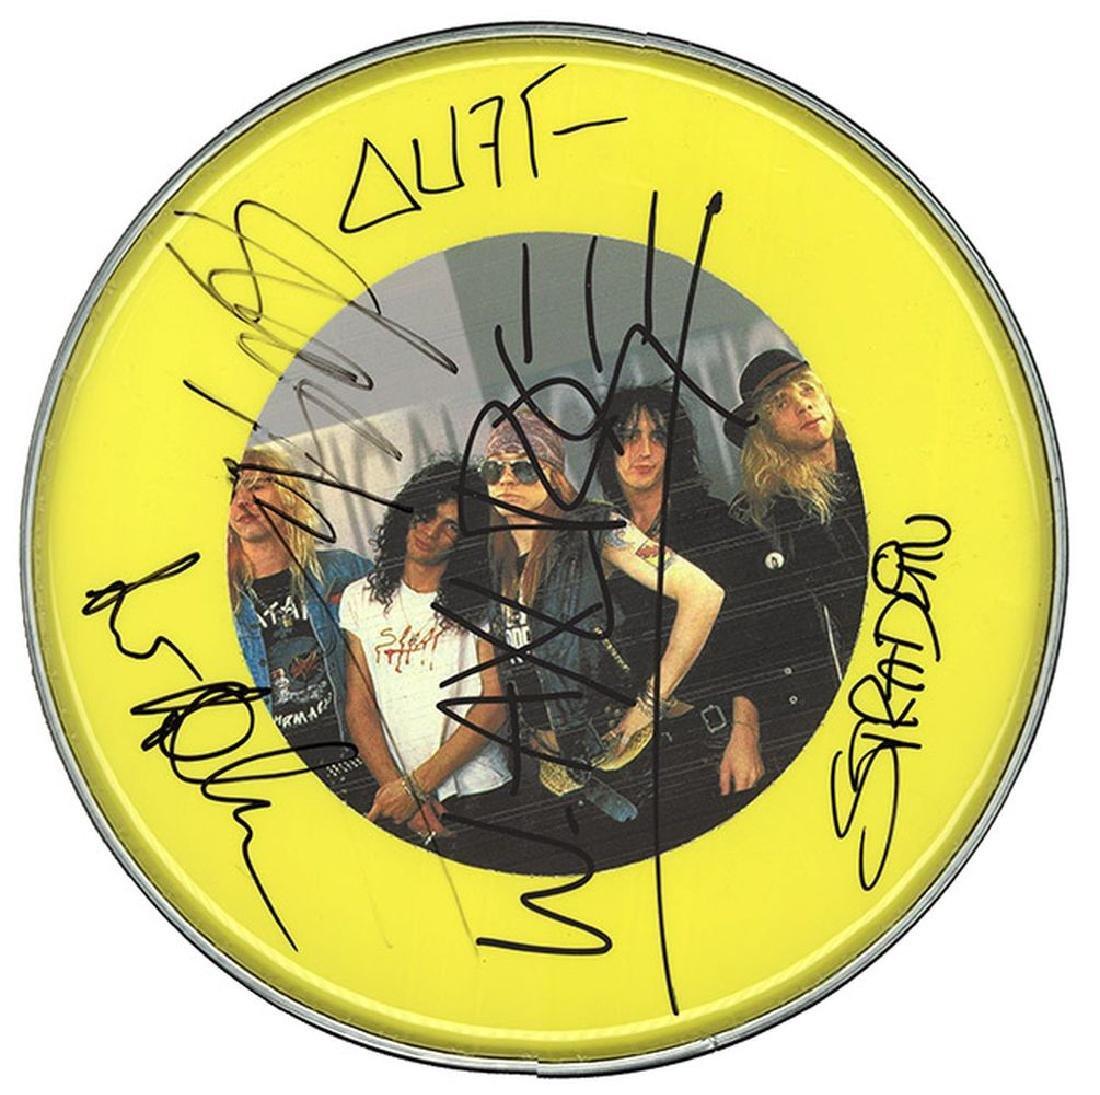 Guns N Roses Signed Drum Head